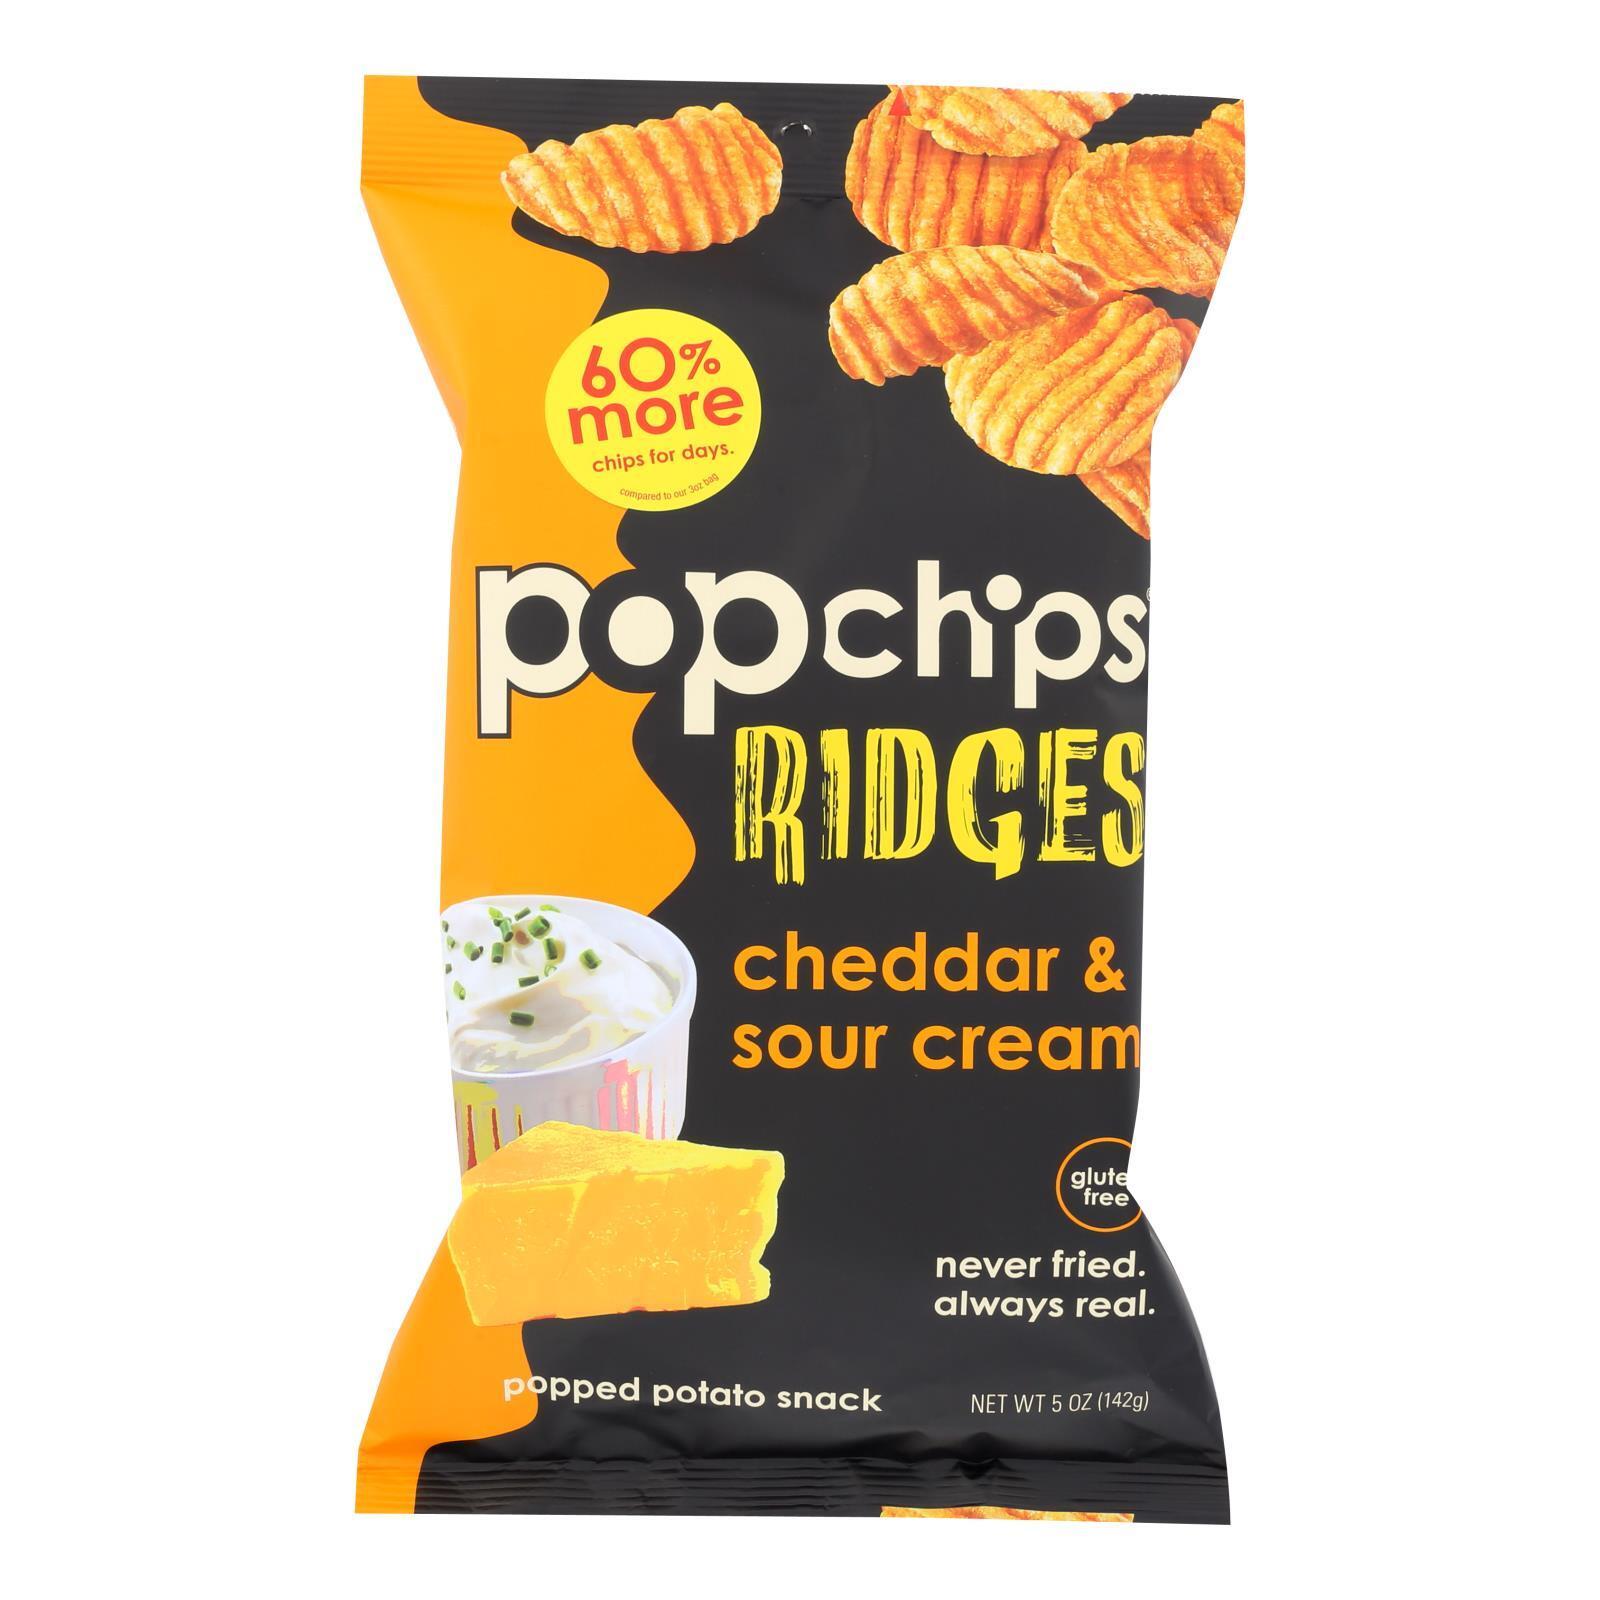 Popchips Potato Chip - Ridges - Cheddar - Sour Cream - Case of 12 - 5 oz